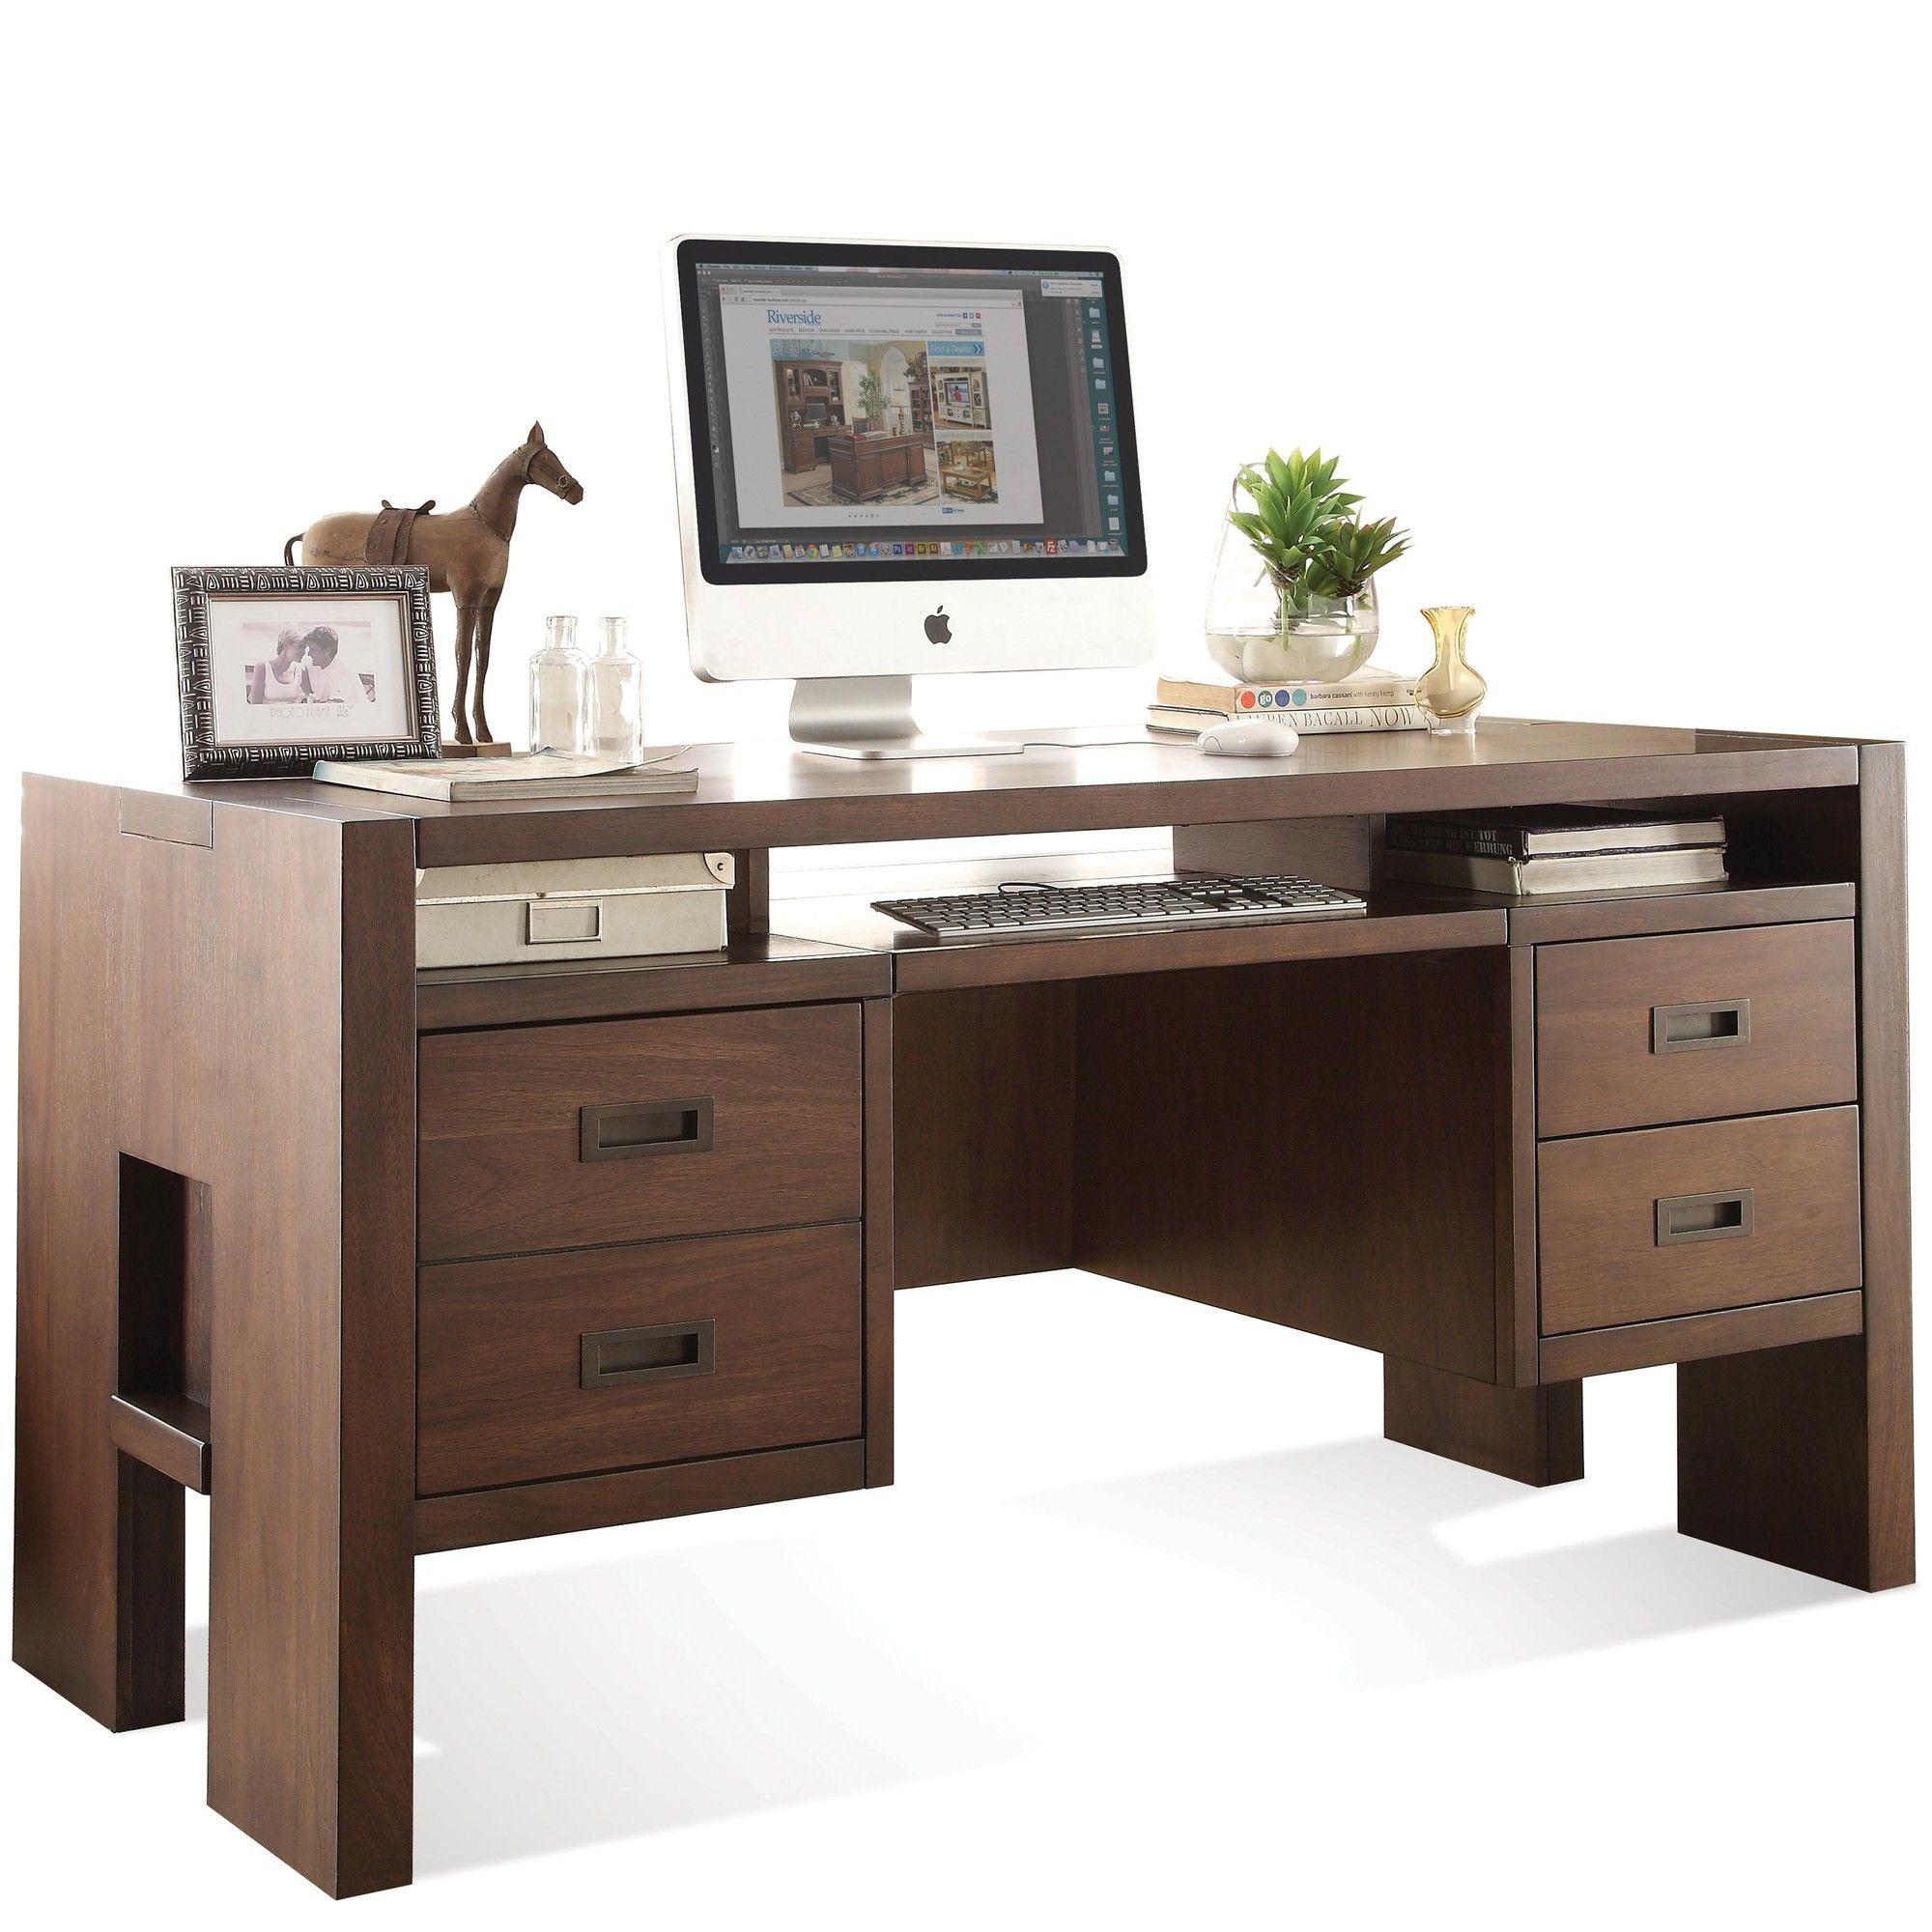 Riverside Home Office Executive Desk 44732: Riverside Furniture Terra Vista Computer Desk